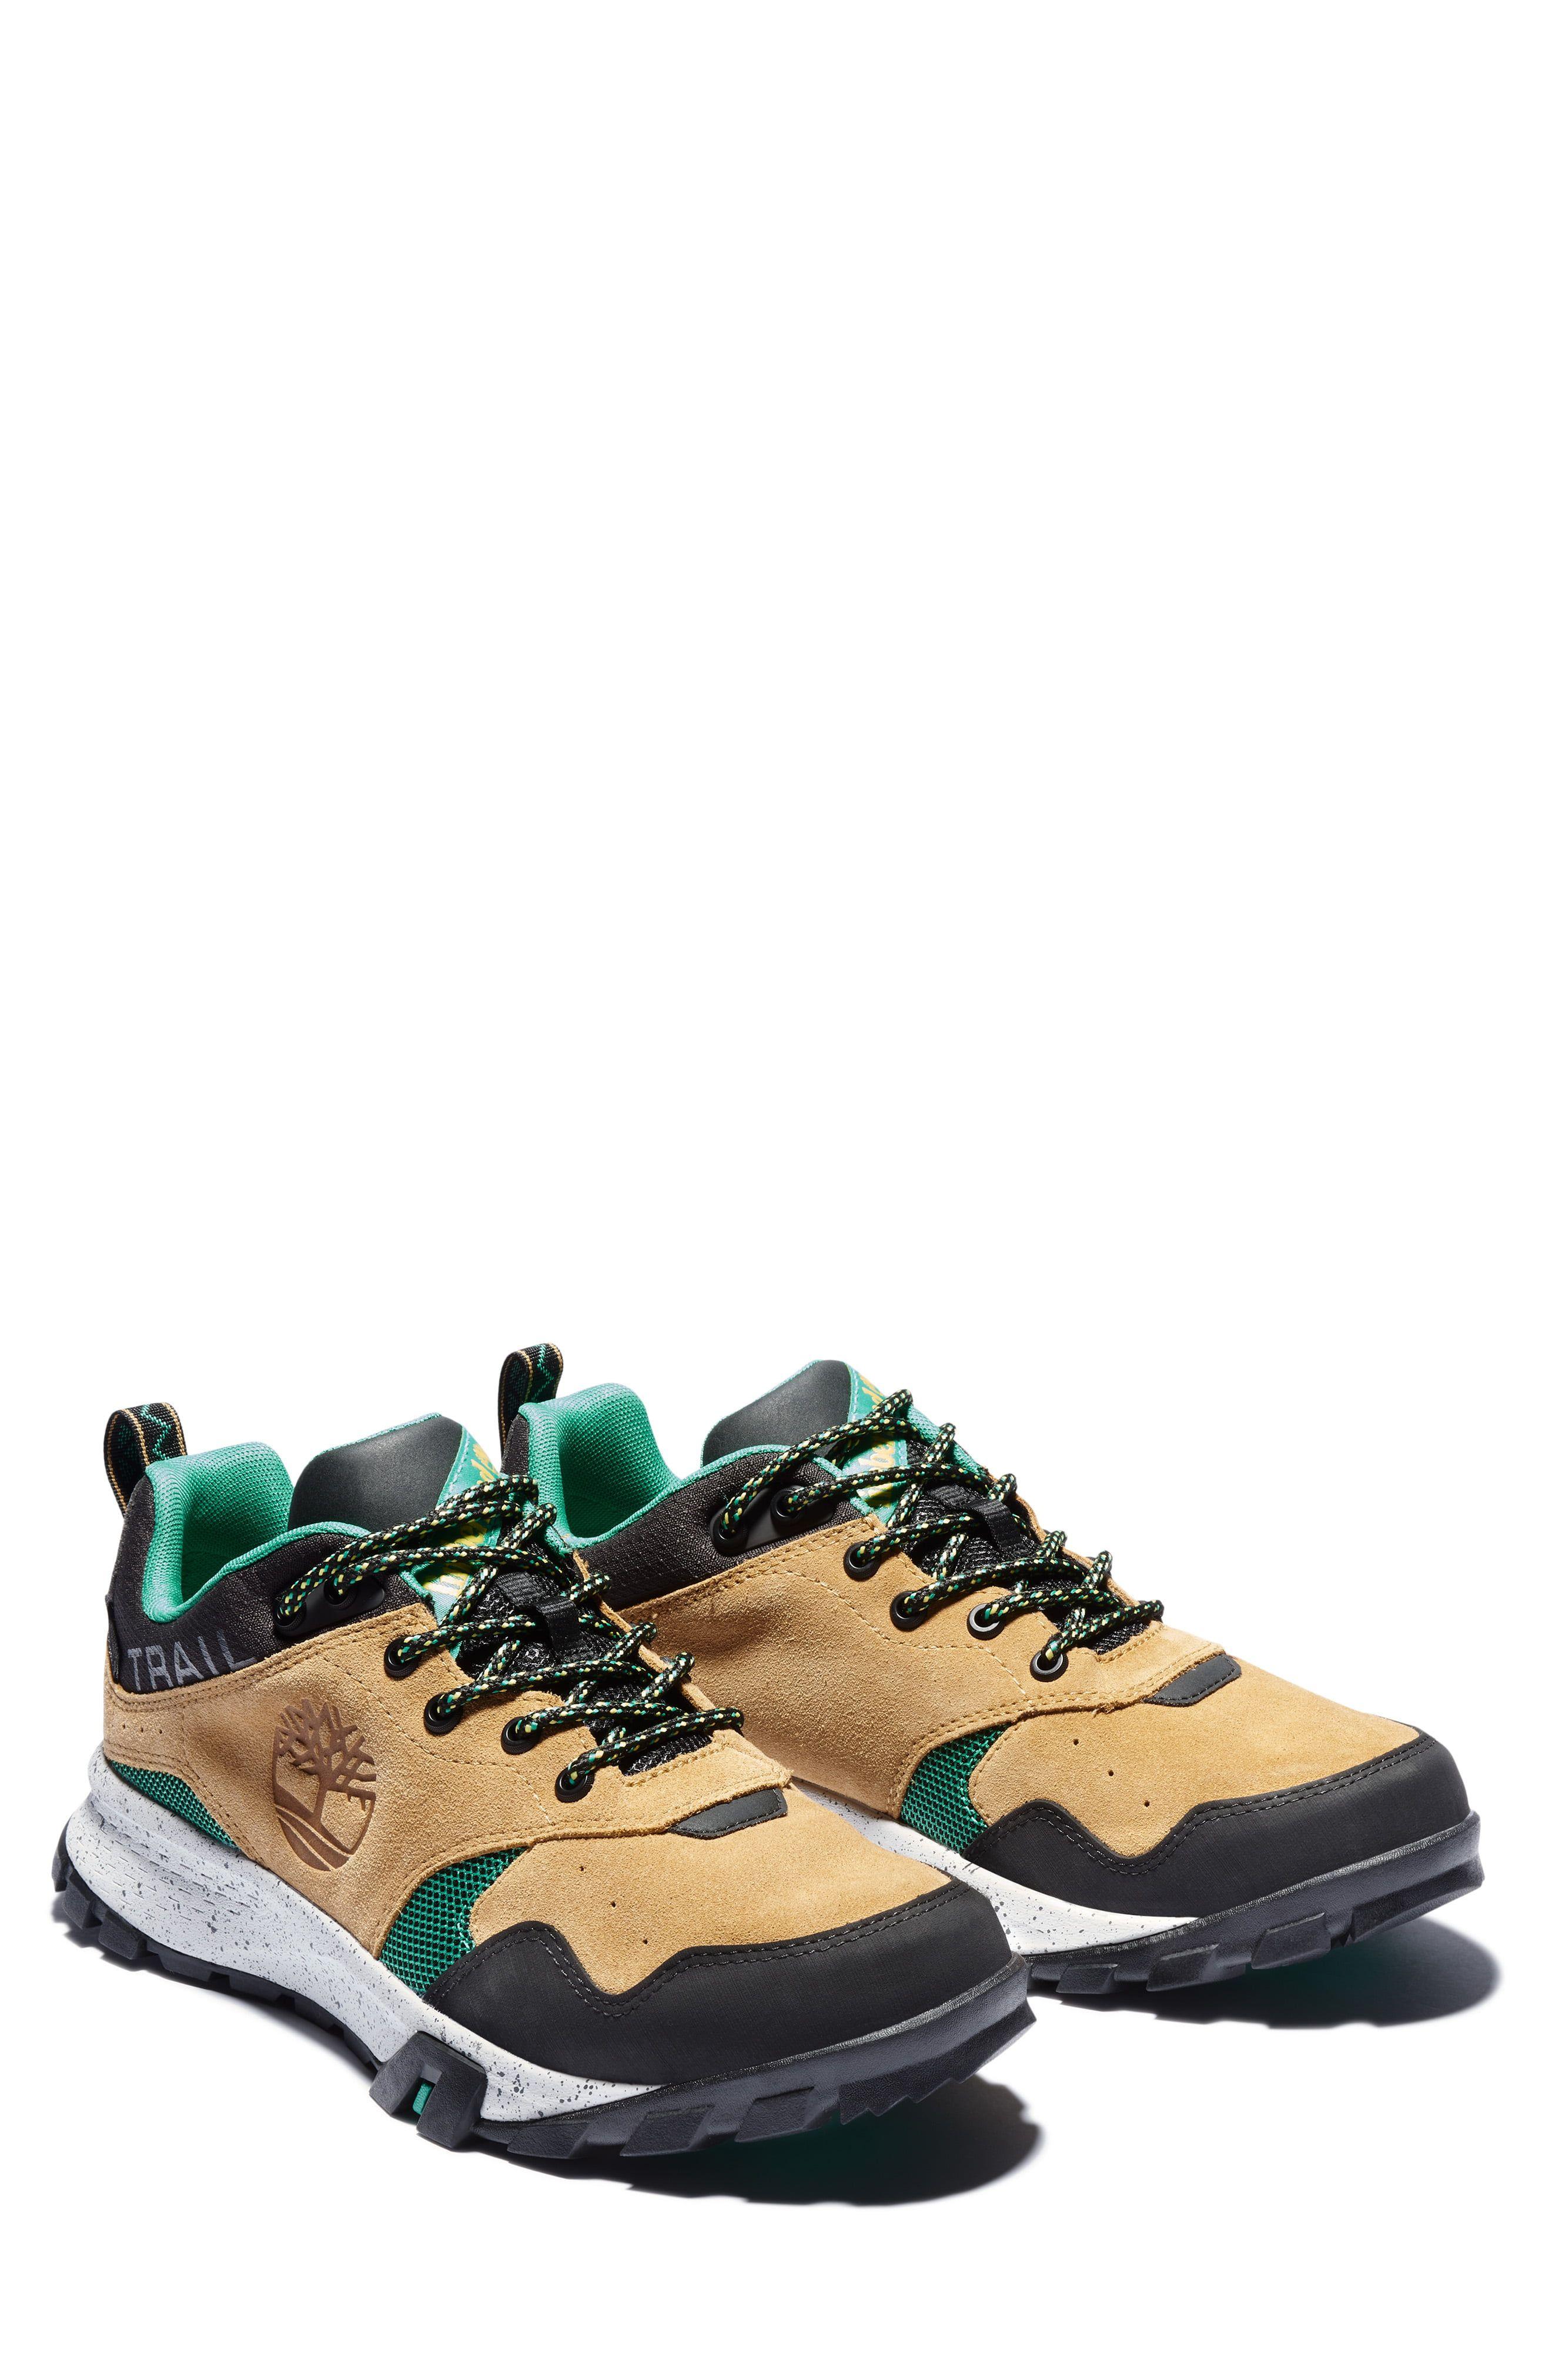 Men's Timberland Garrison Trail Waterproof Hiking Shoe, Size